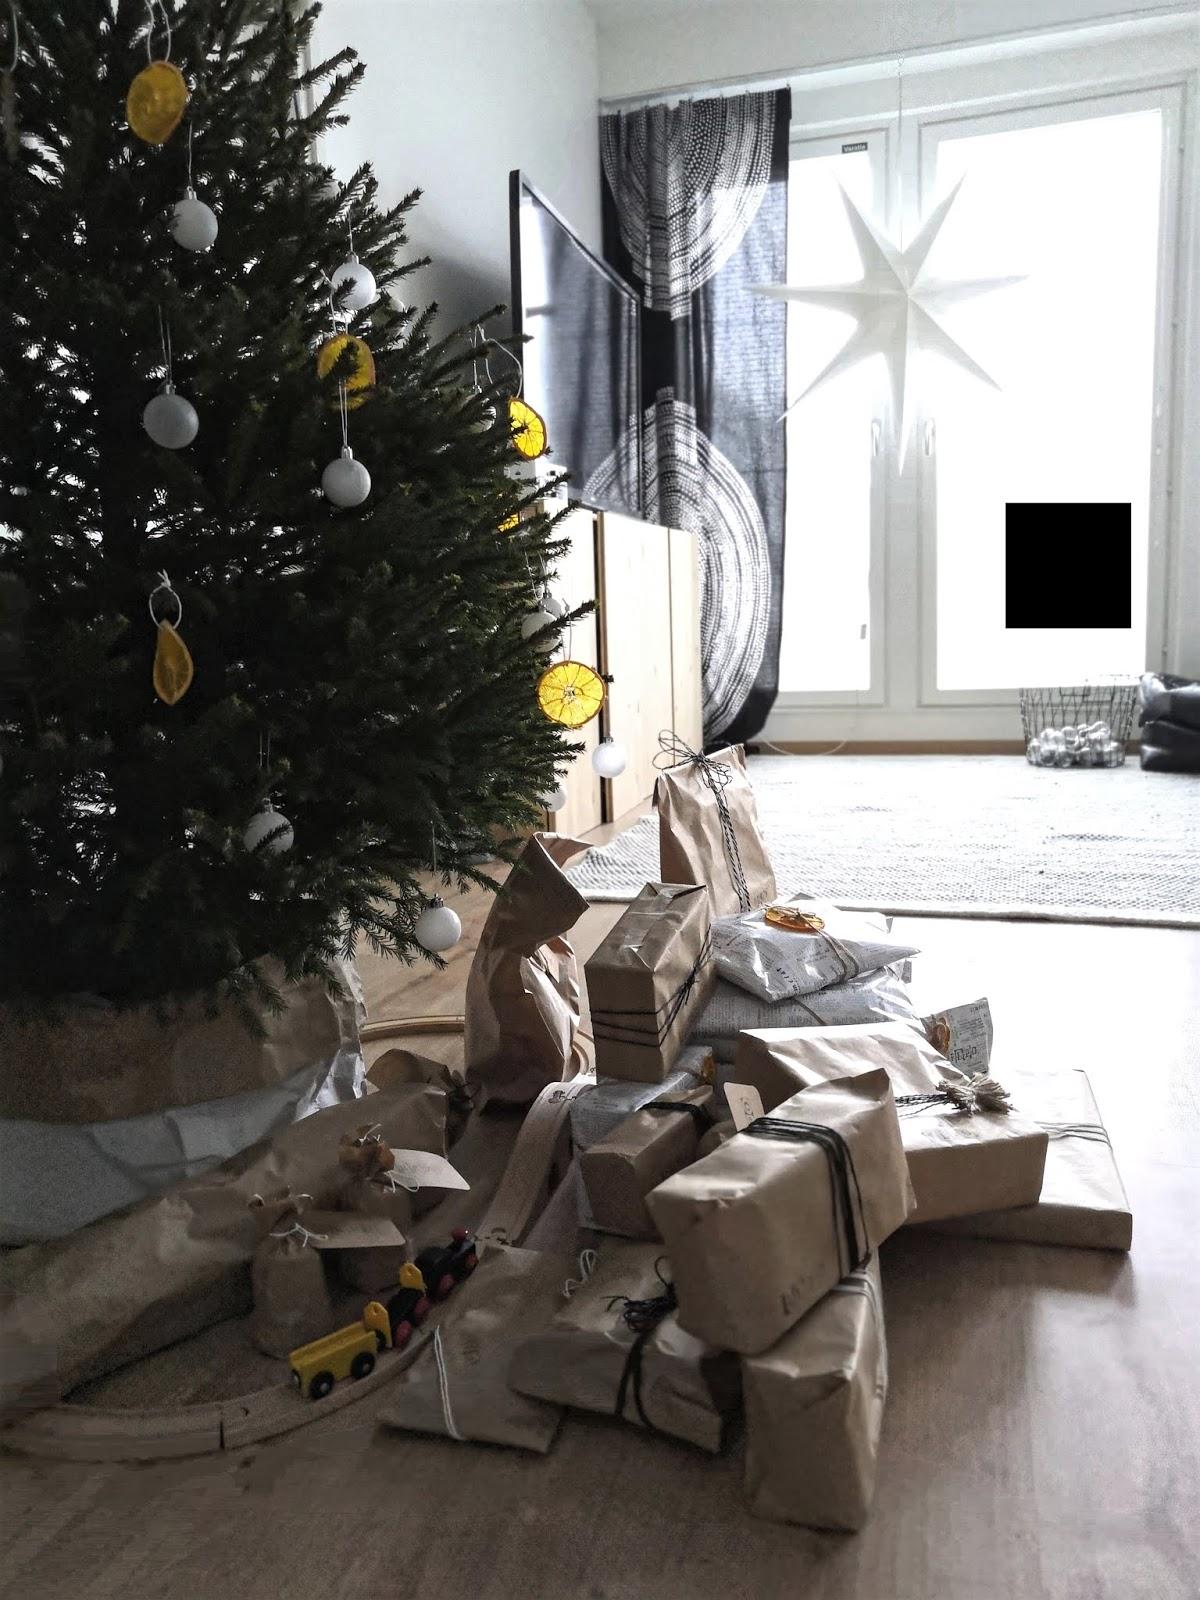 Ensimmäinen dating joulu lahjat